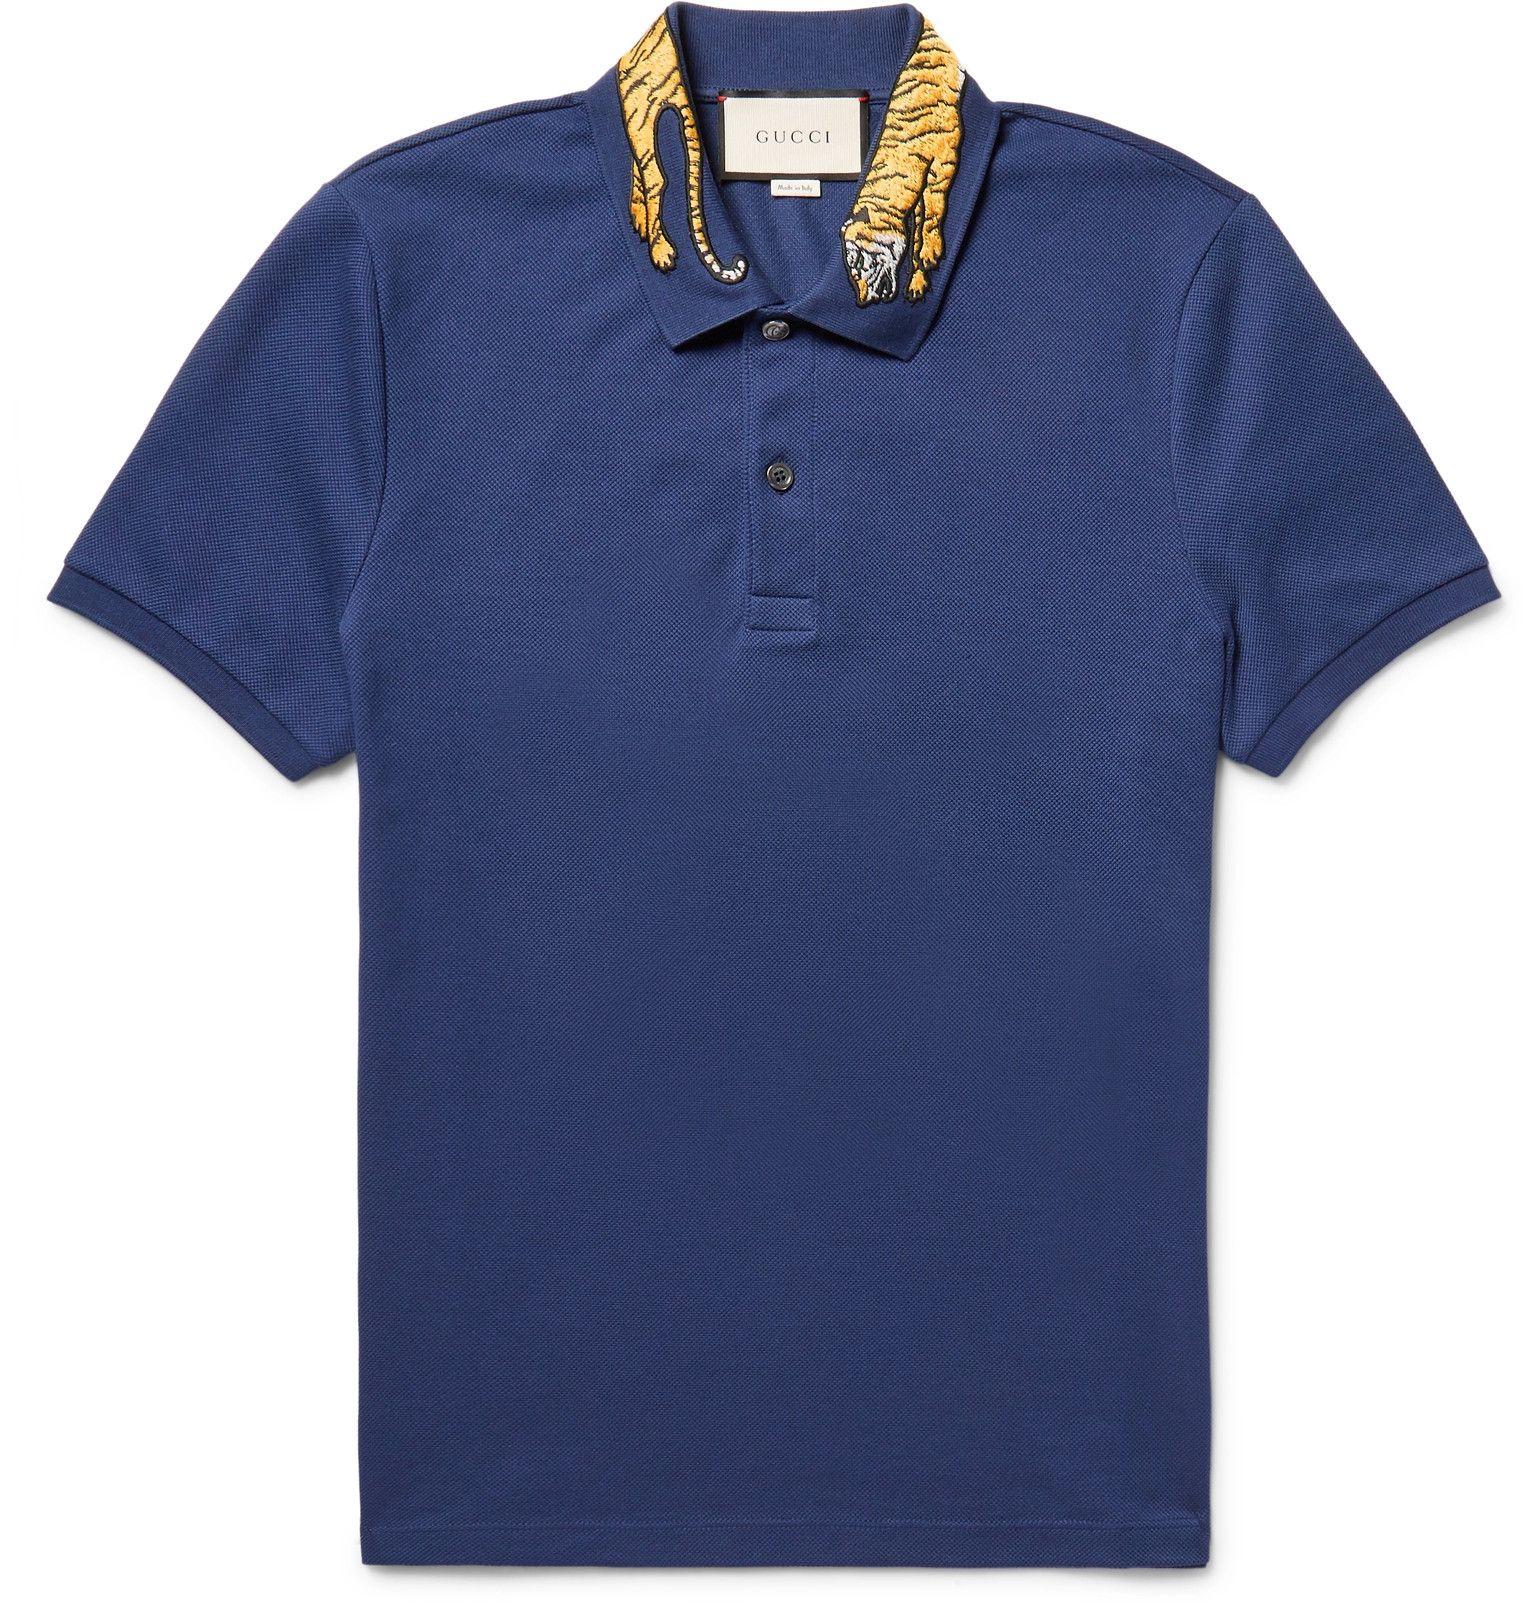 Mens Designer Polo Shirts, Slim, Pique Polo Shirt, Man Shop, Shirt Designs c94bc6b667